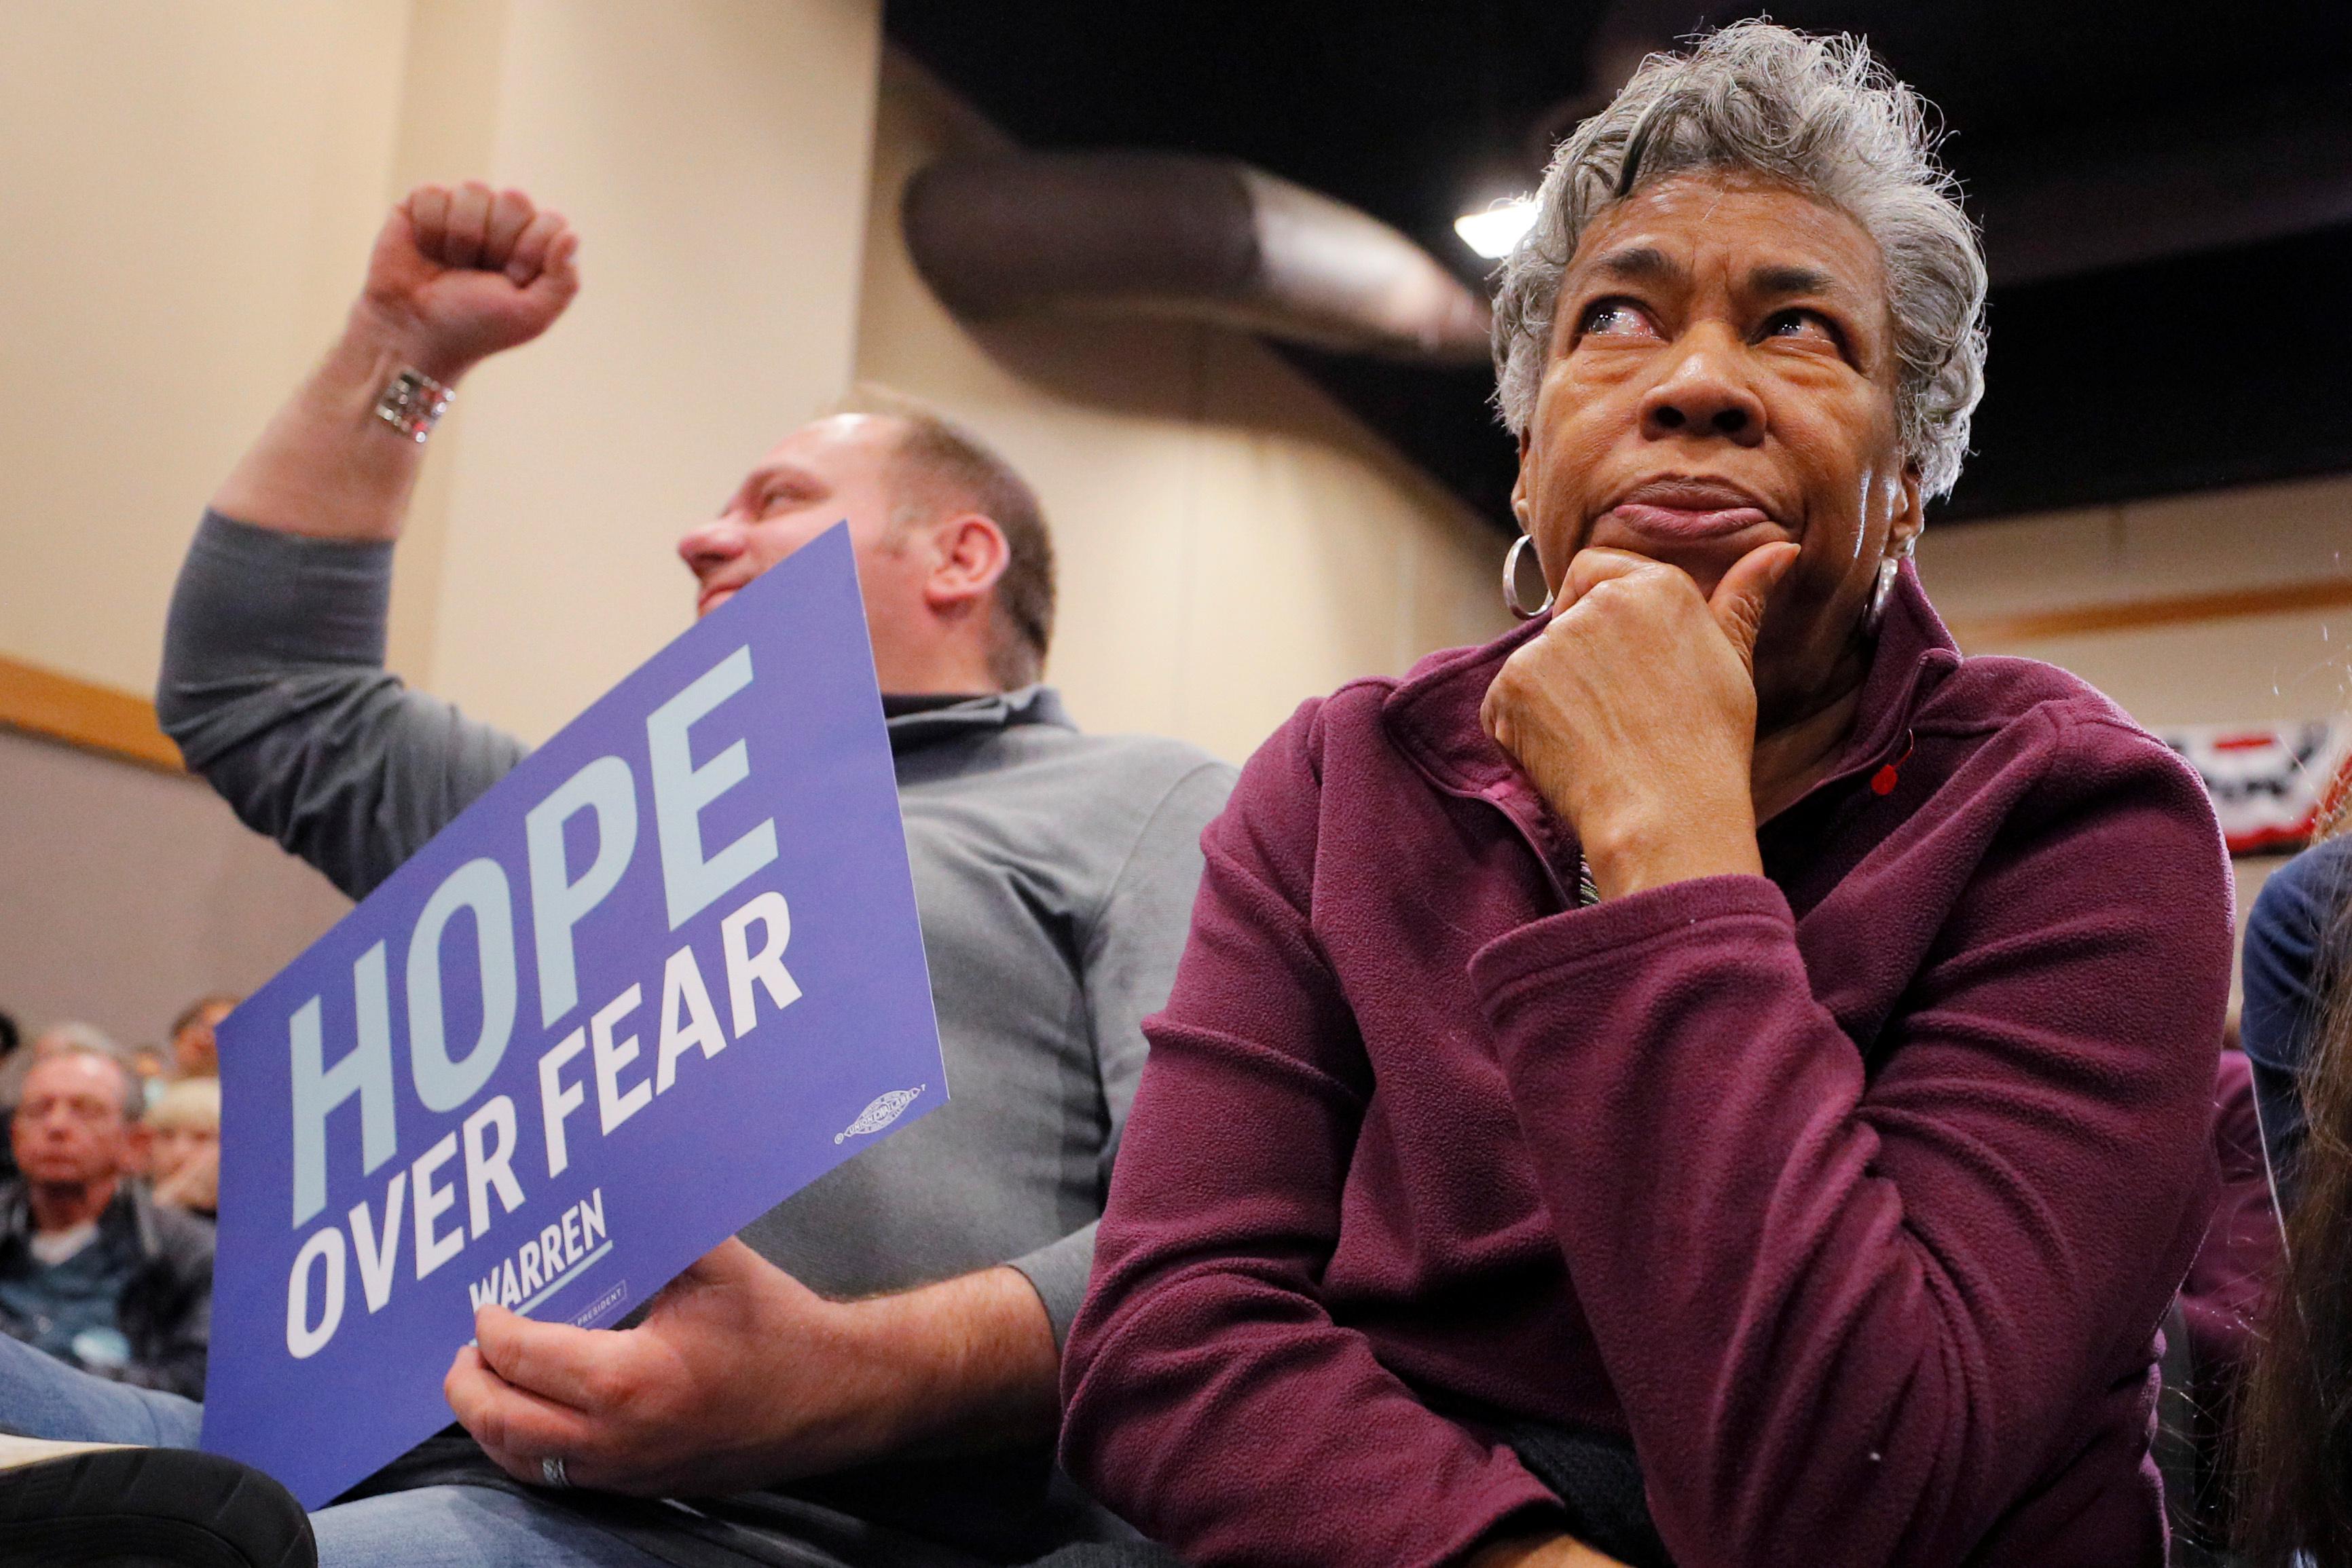 Democratic 2020 US presidential candidate Warren in Iowa